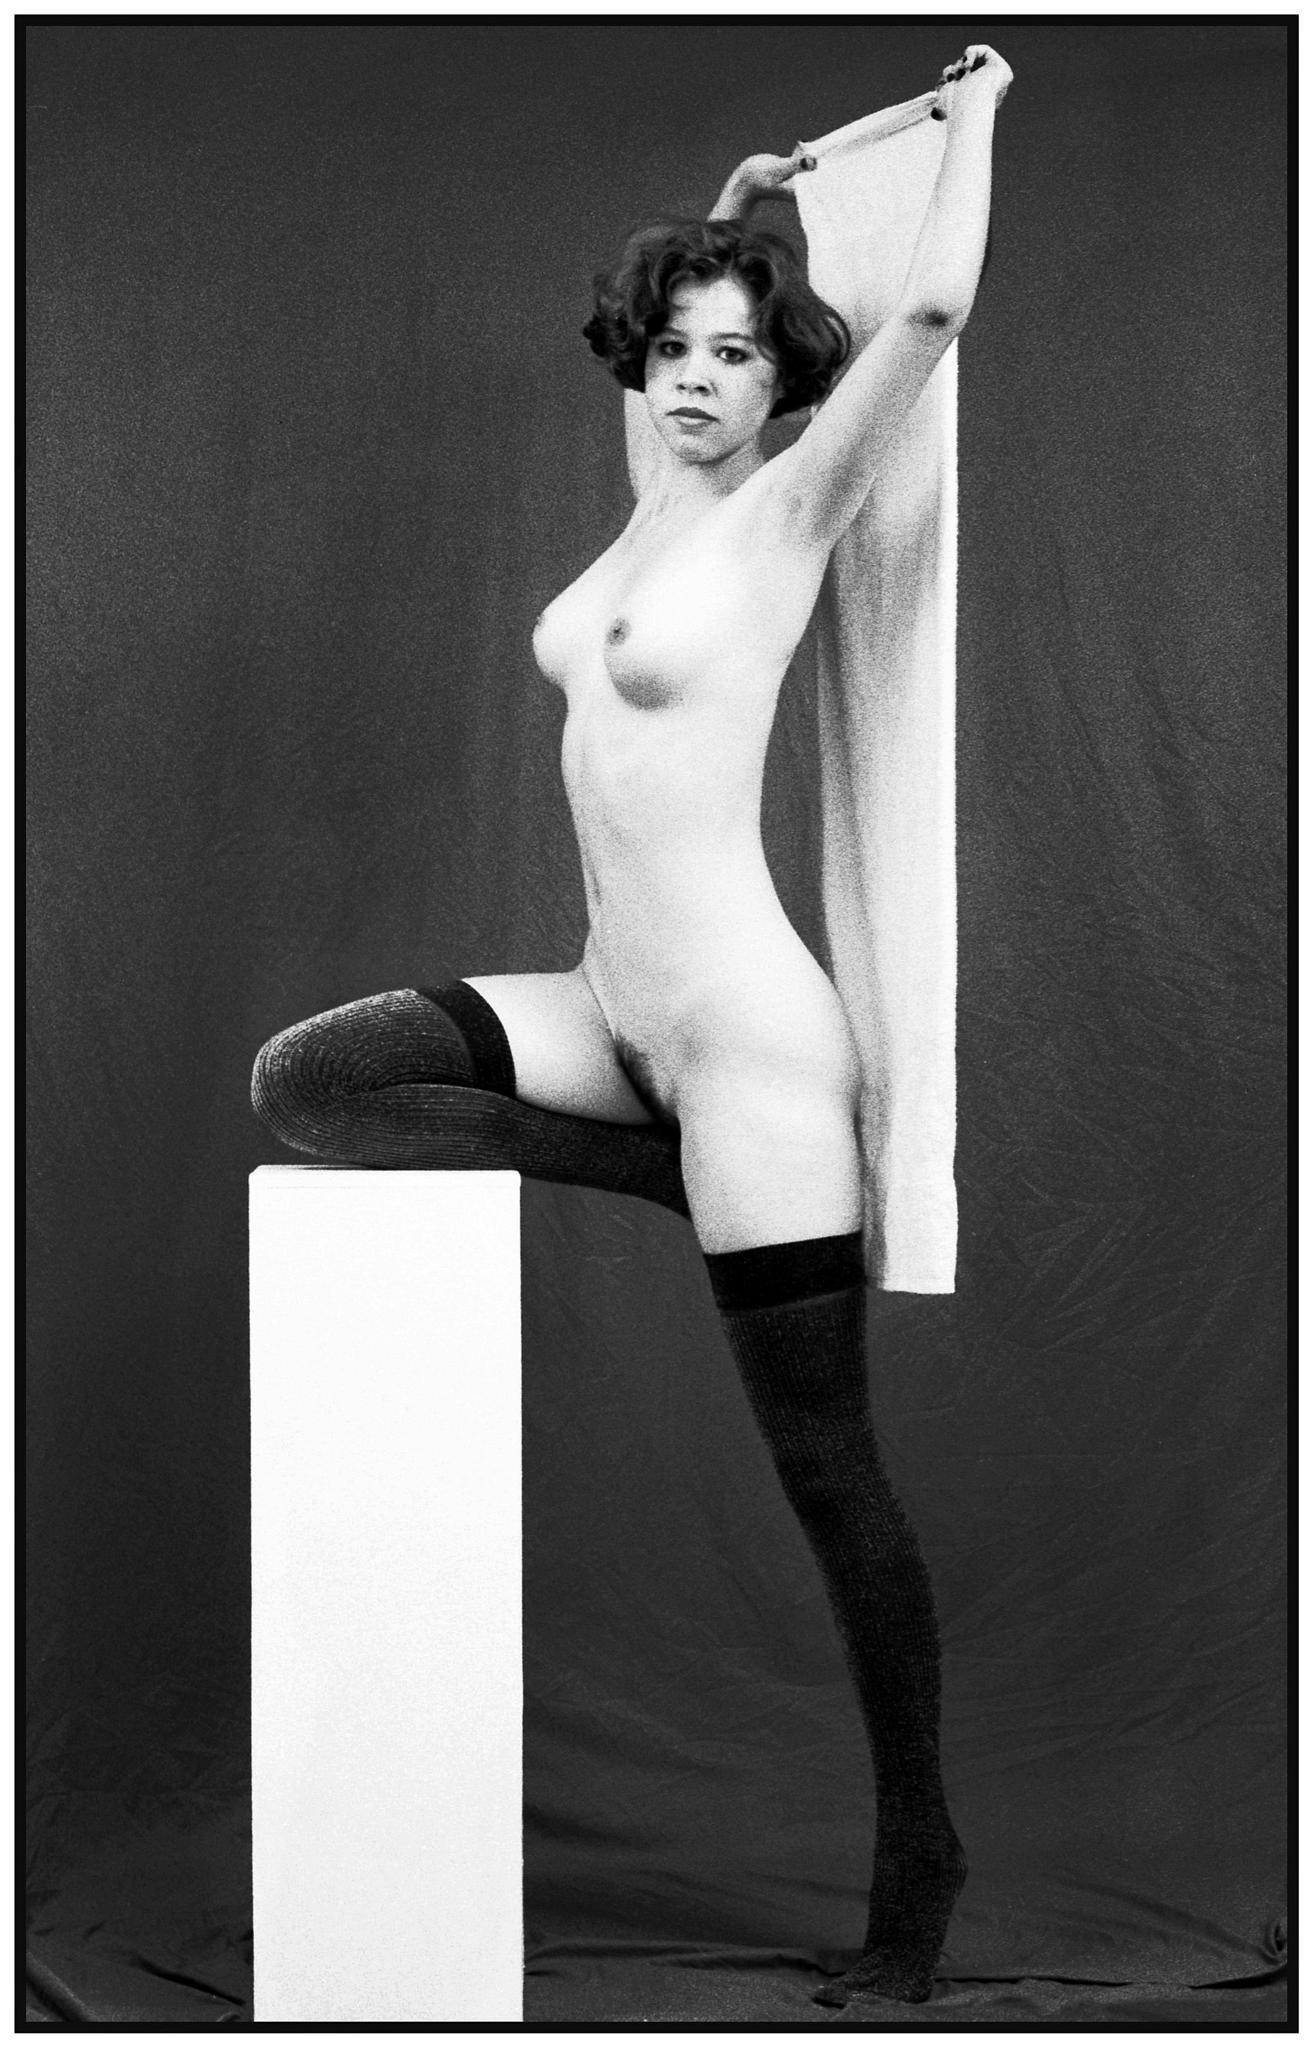 Almost nude by Etienne Chalmet